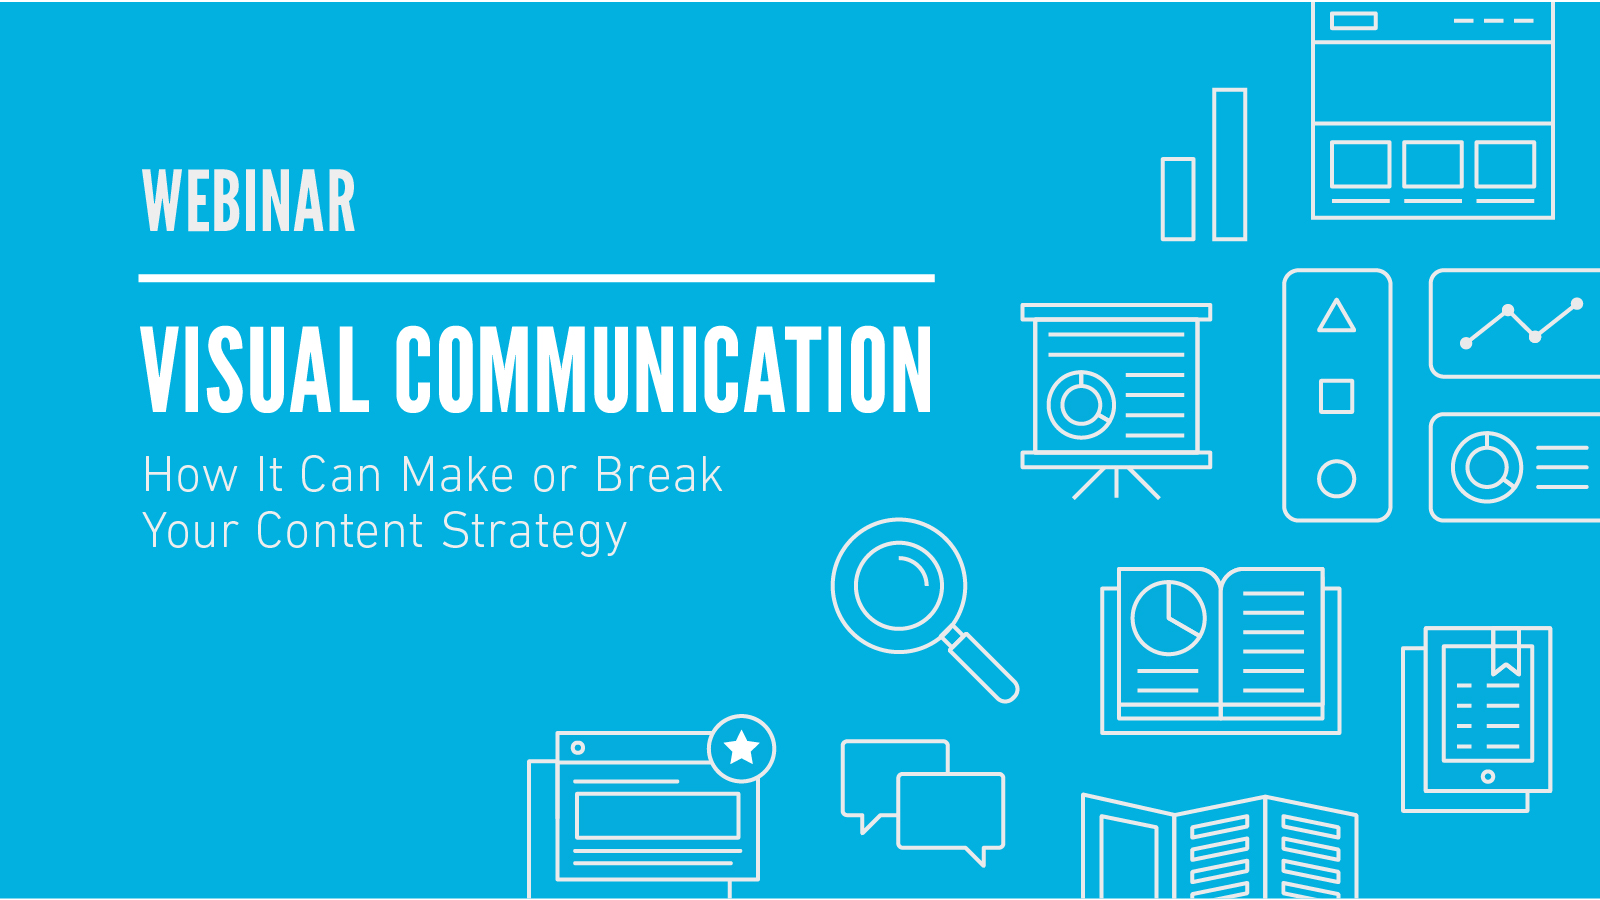 Visual communication content strategy webinar slide design